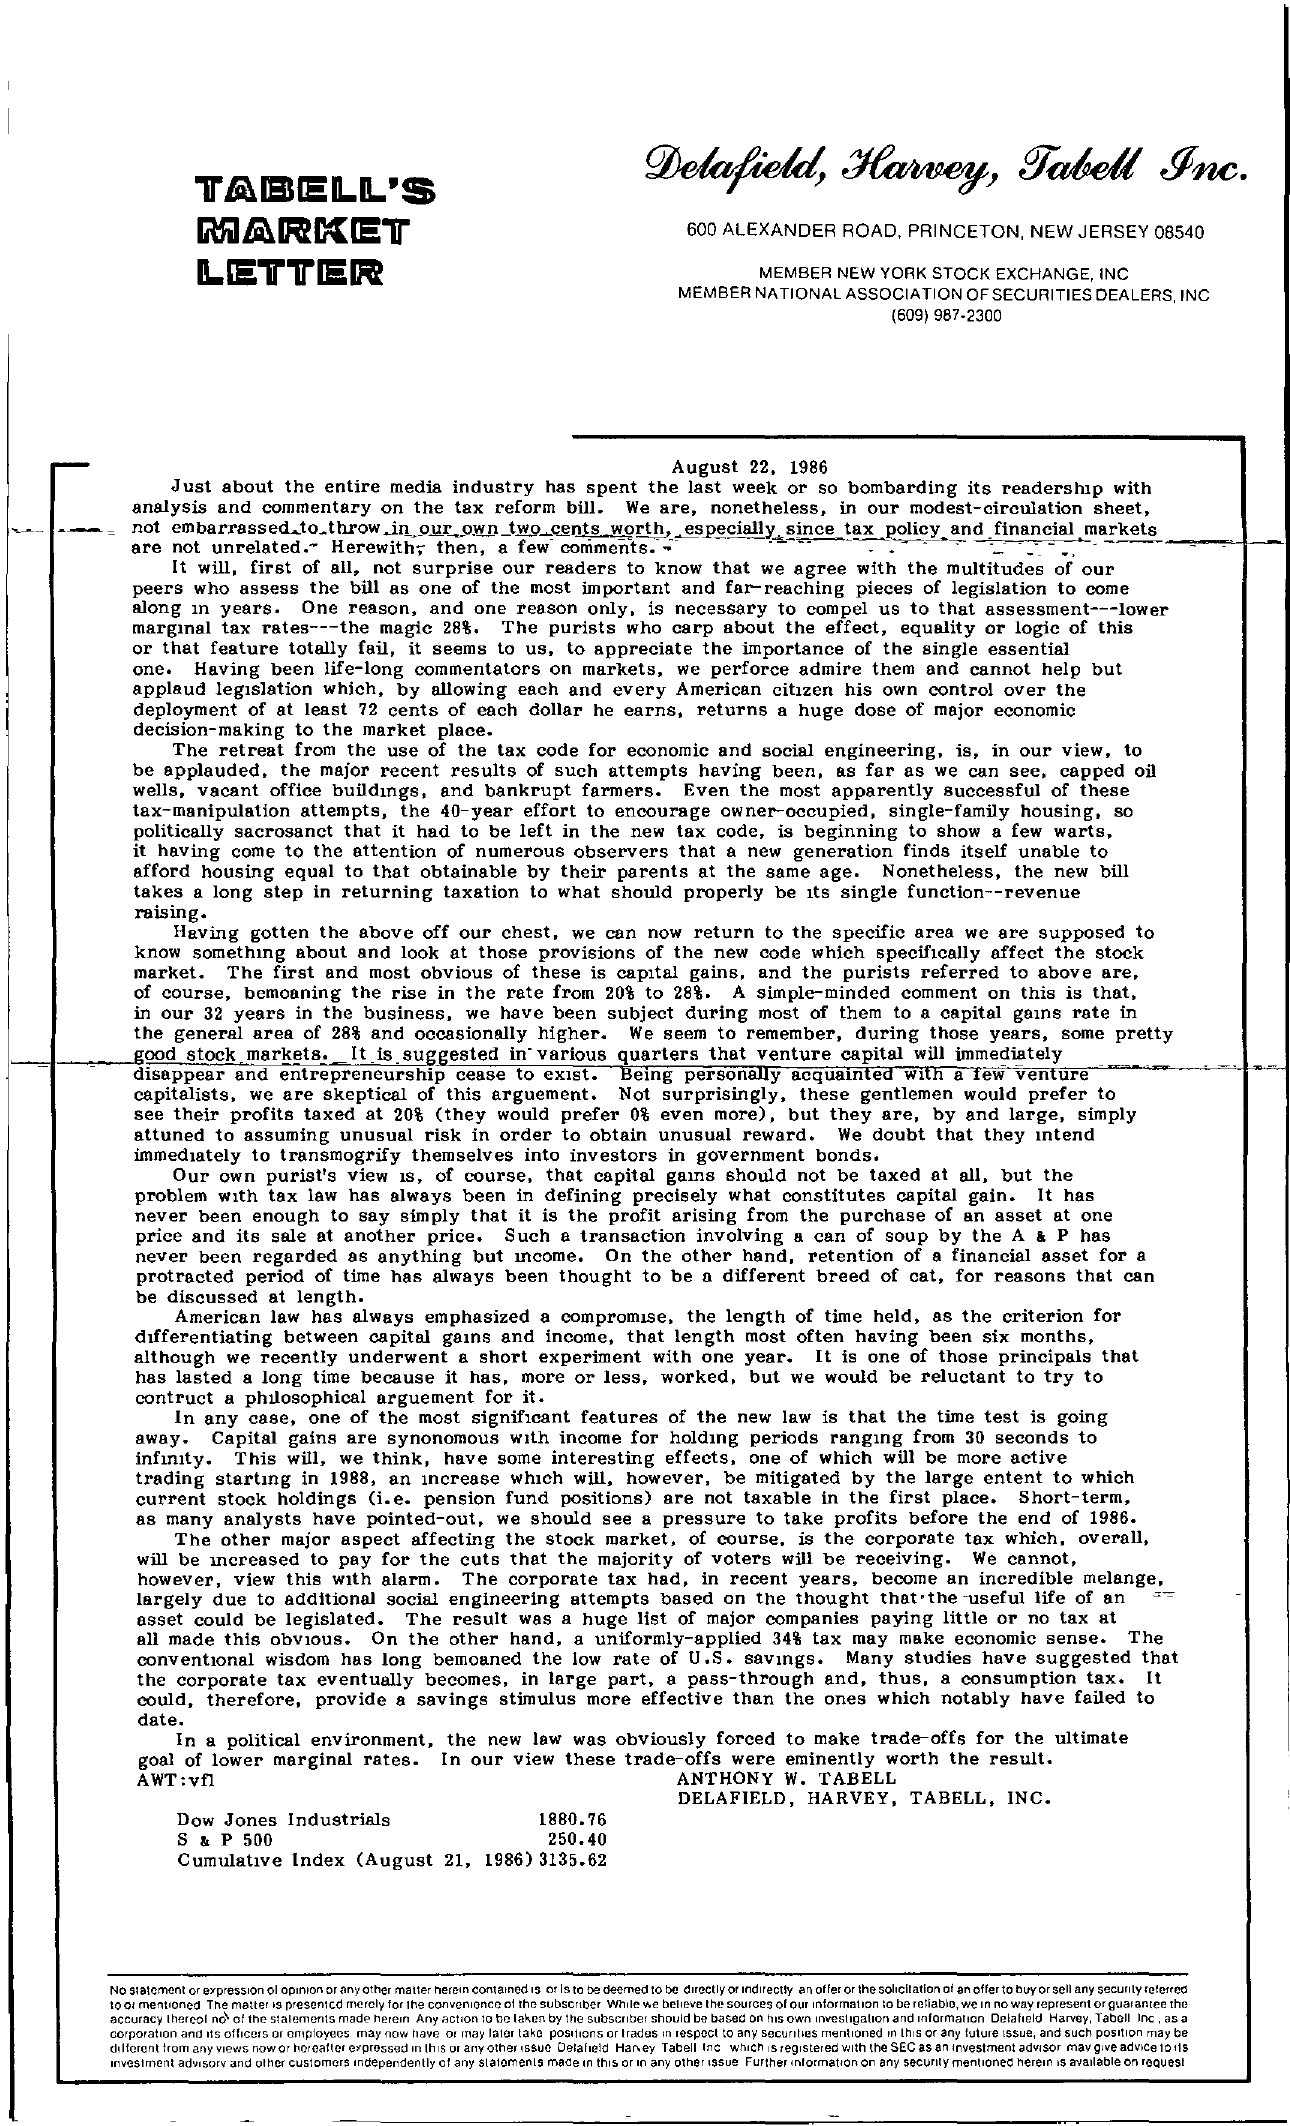 Tabell's Market Letter - August 22, 1986